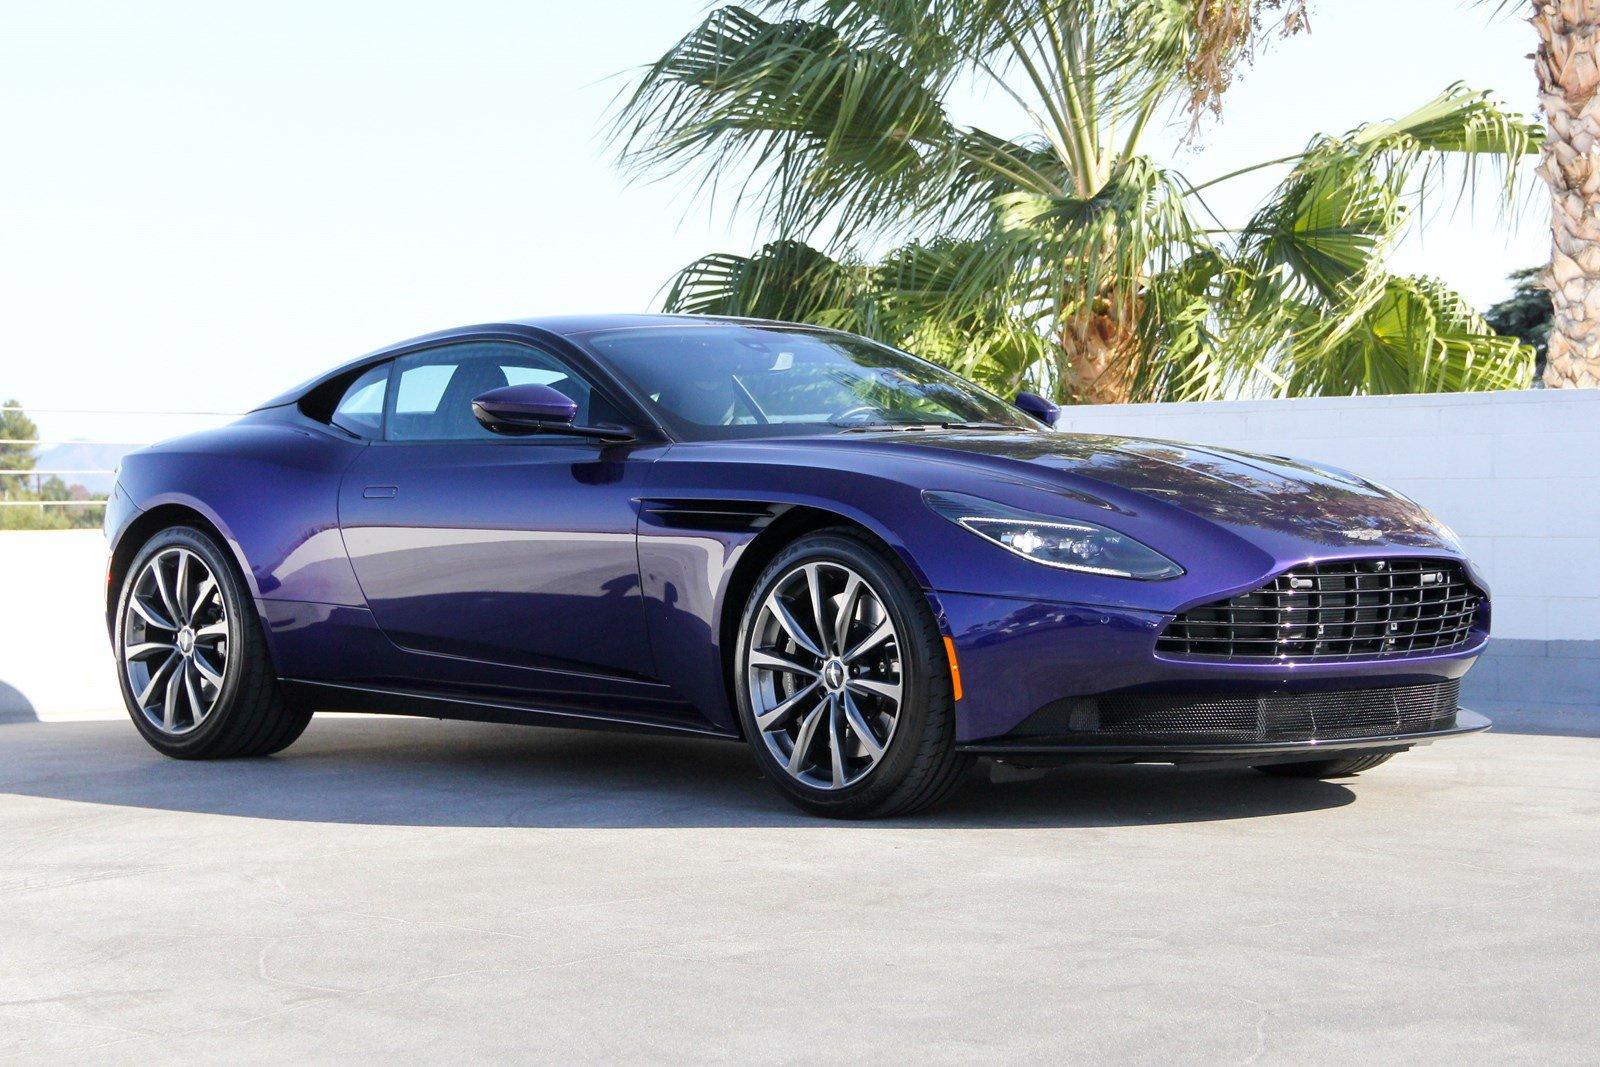 Aston Martin Offers >> Galpin Aston Martin Los Angeles Aston Martin Special Offers Van